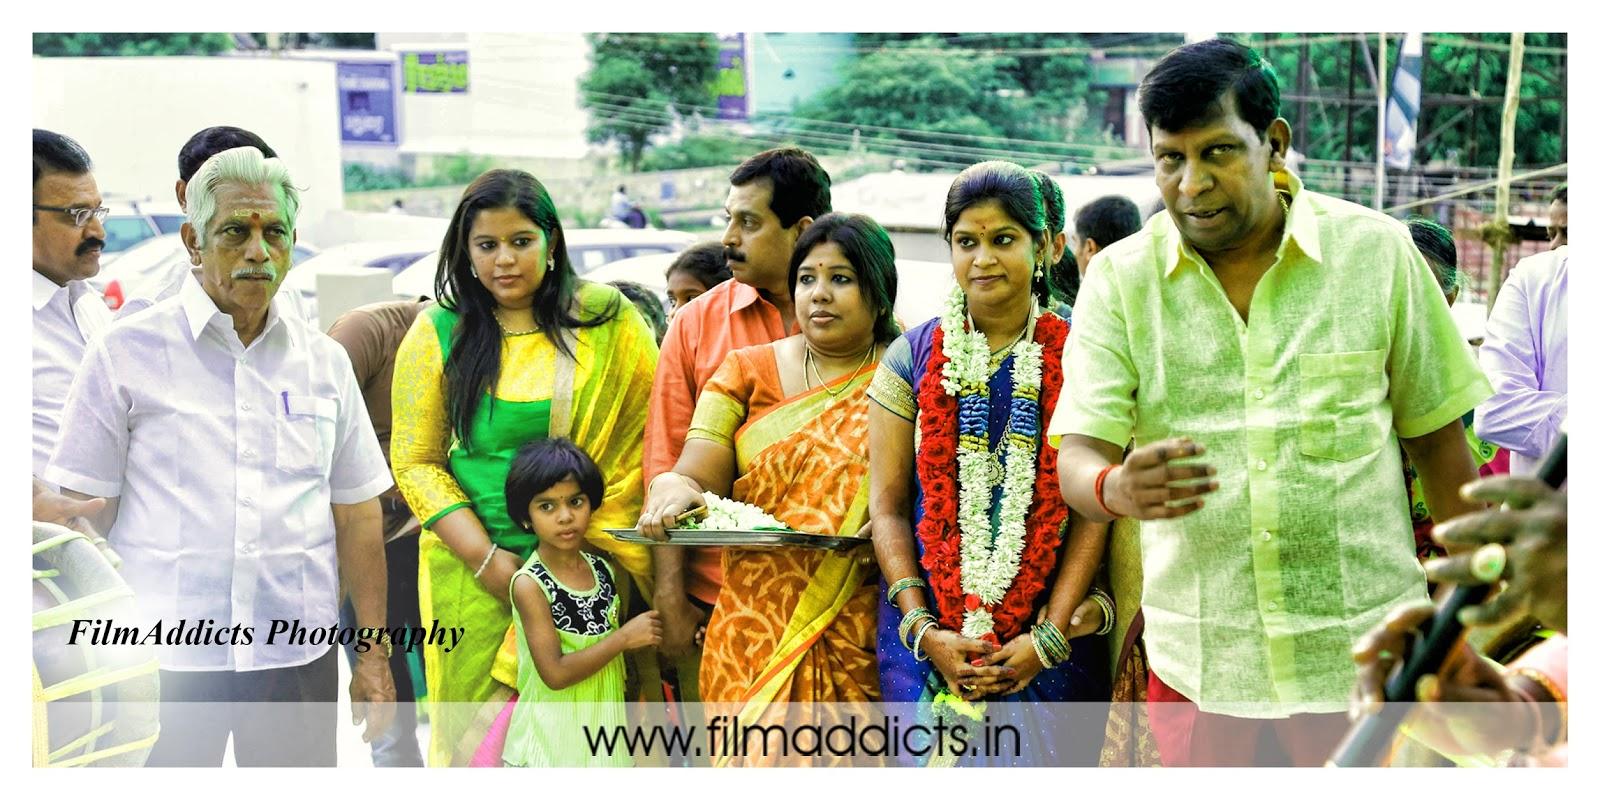 FilmAddicts Photography: Tamil Comdey Actor Vadivelu ... Vadivelu Daughter Kavya Marriage